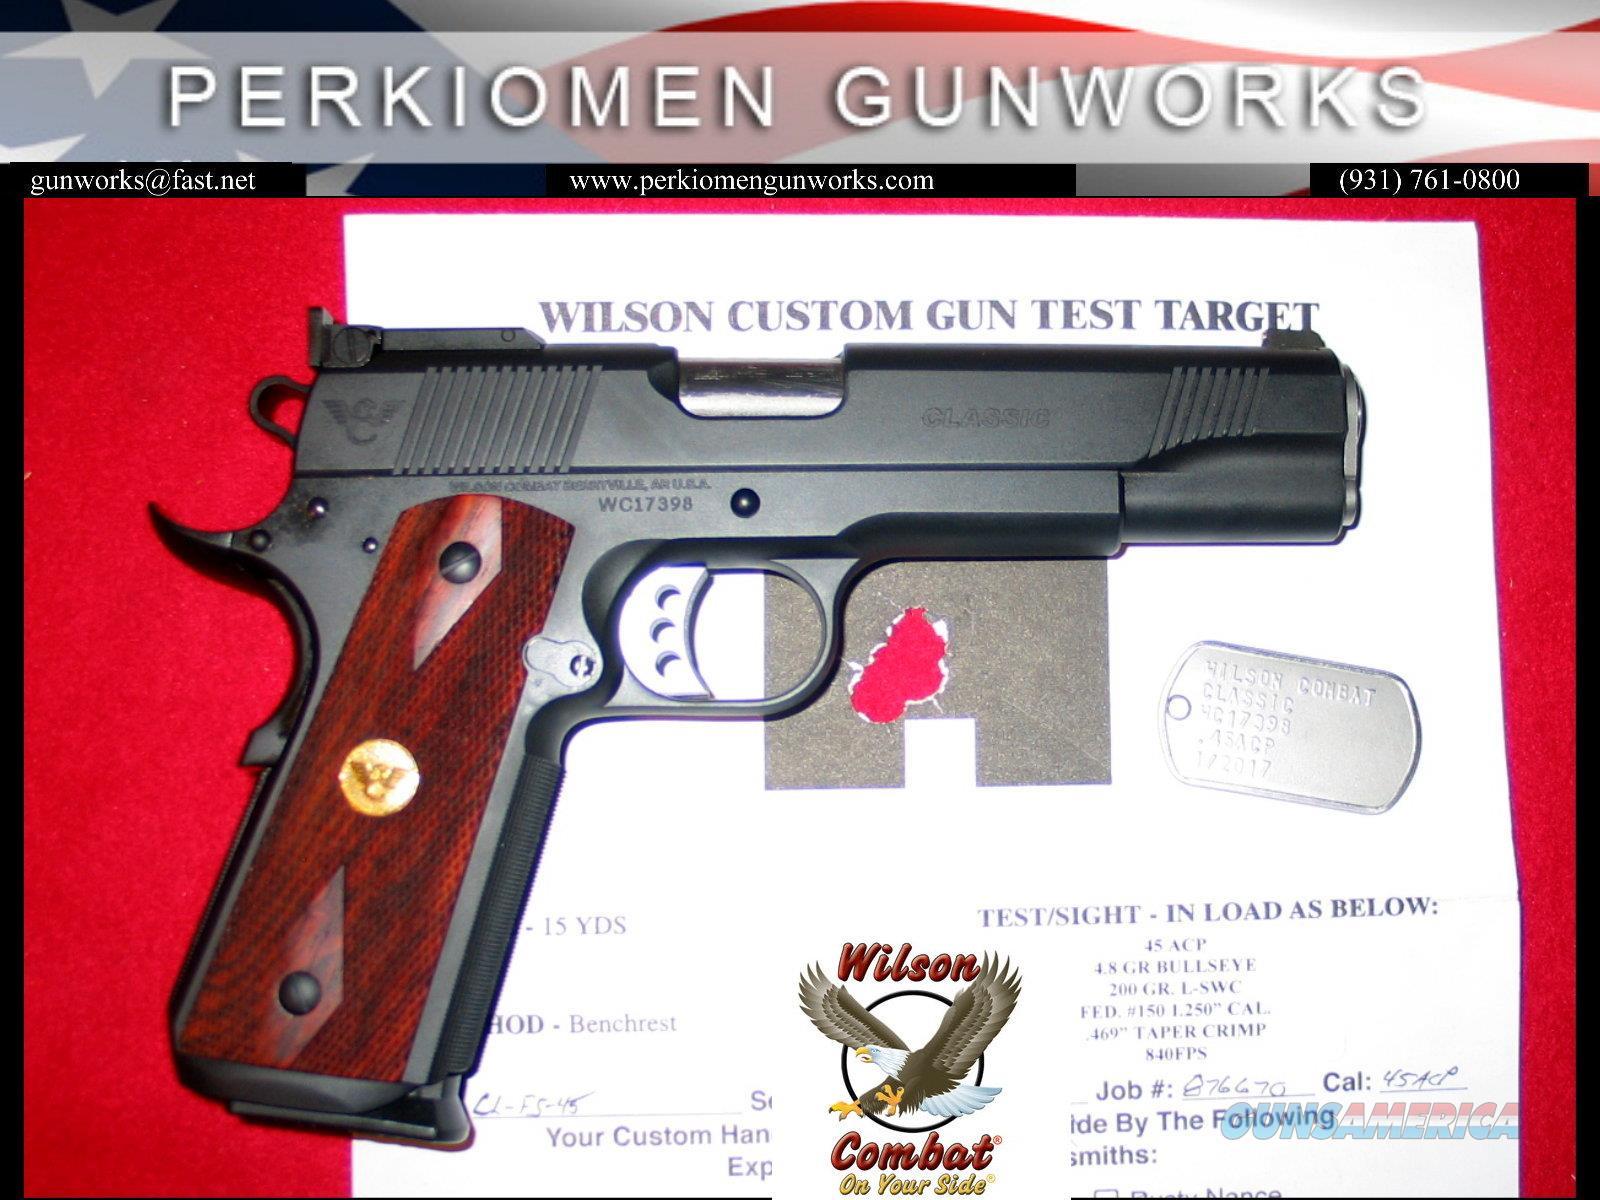 Classic .45acp, full size 1911, Dlx Blue, Double Diamond grips w-Gold Medallions, NIB  Guns > Pistols > Wilson Combat Pistols